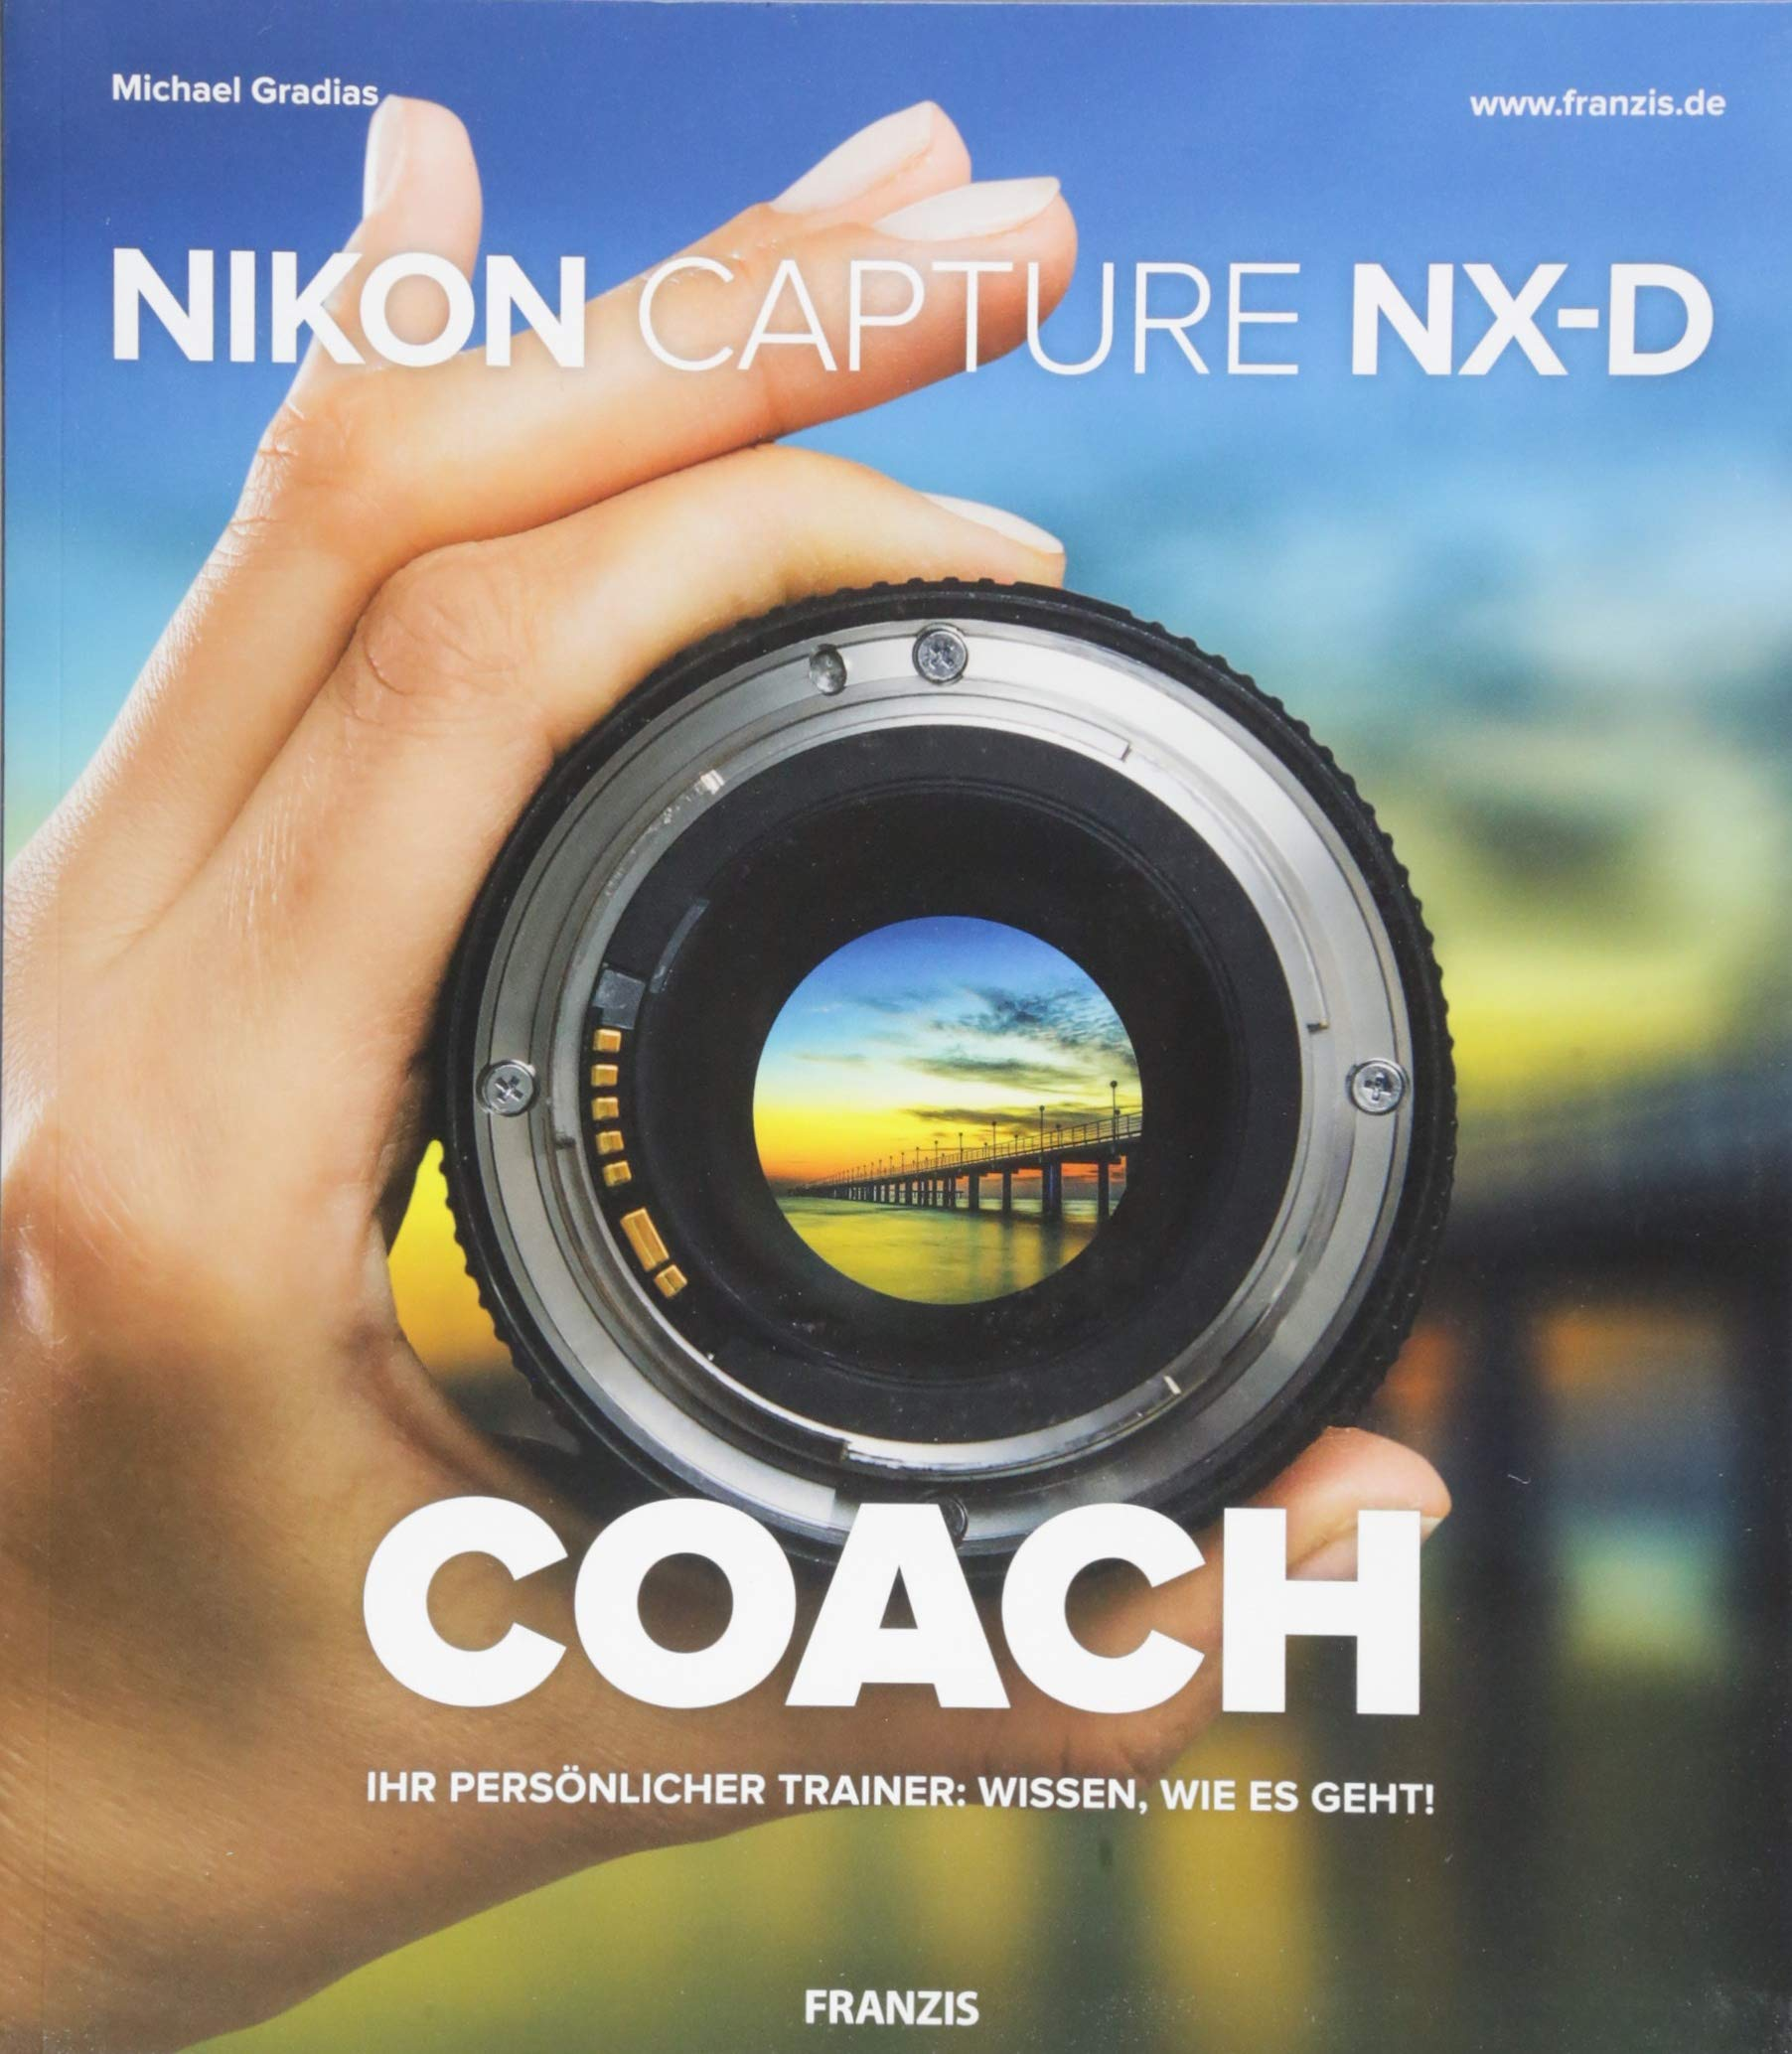 Nikon Capture NX-D COACH: 9783645606394: Amazon com: Books